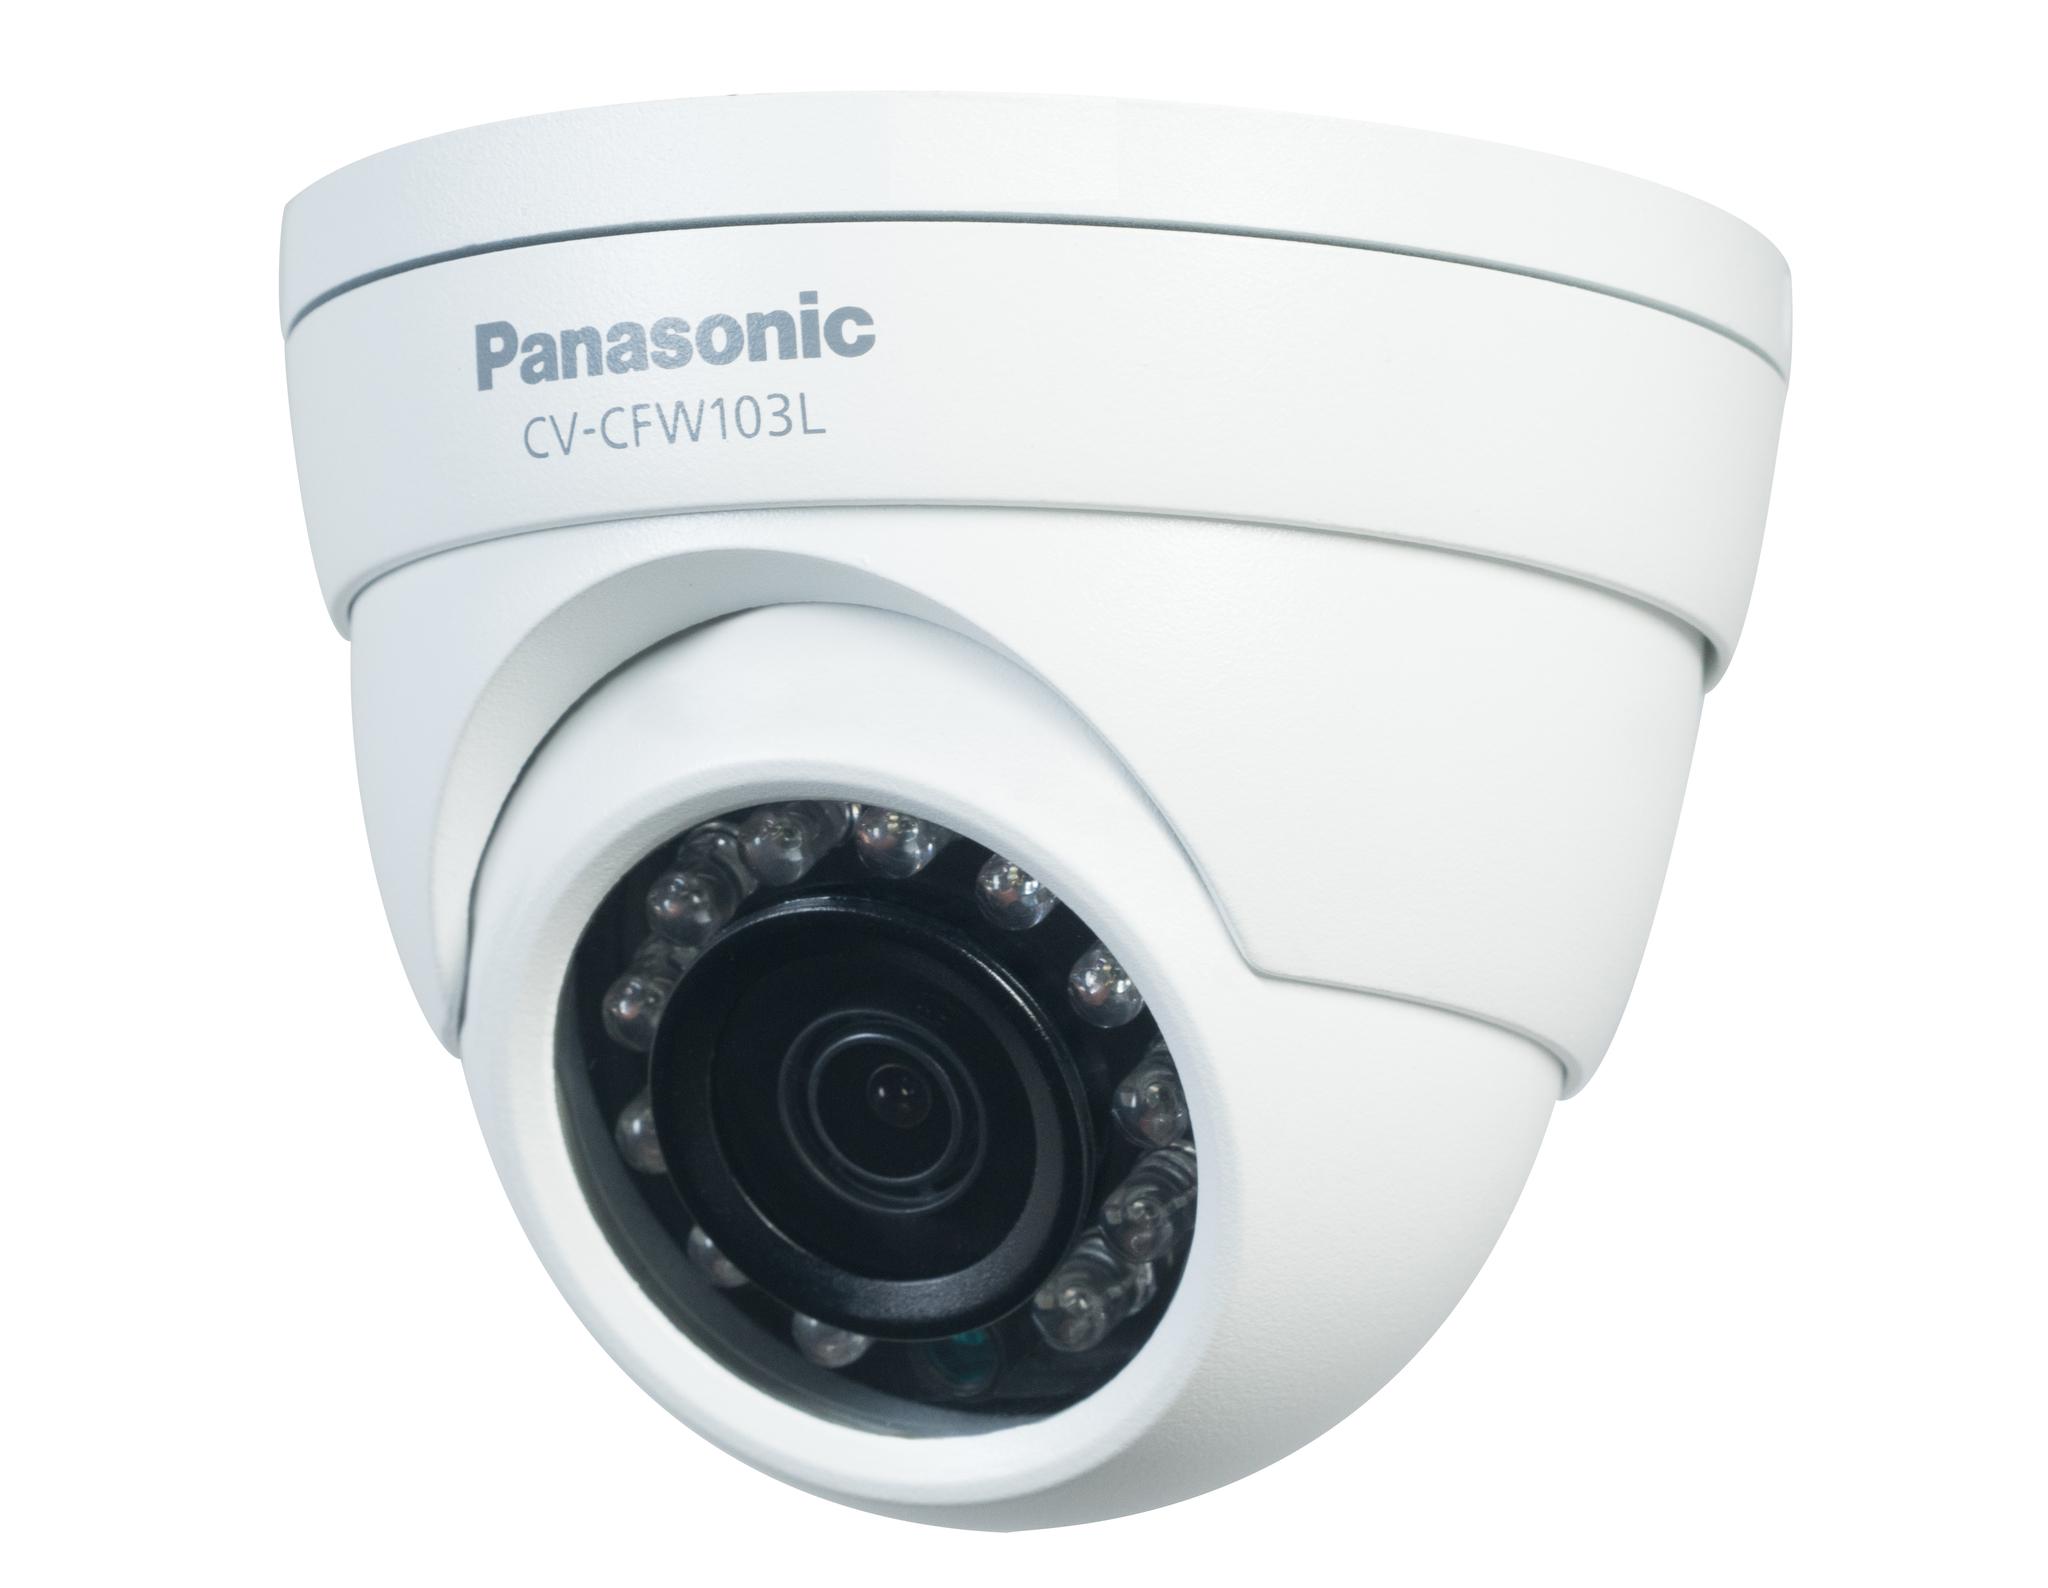 PANASONIC CCTV CV-CFW103L